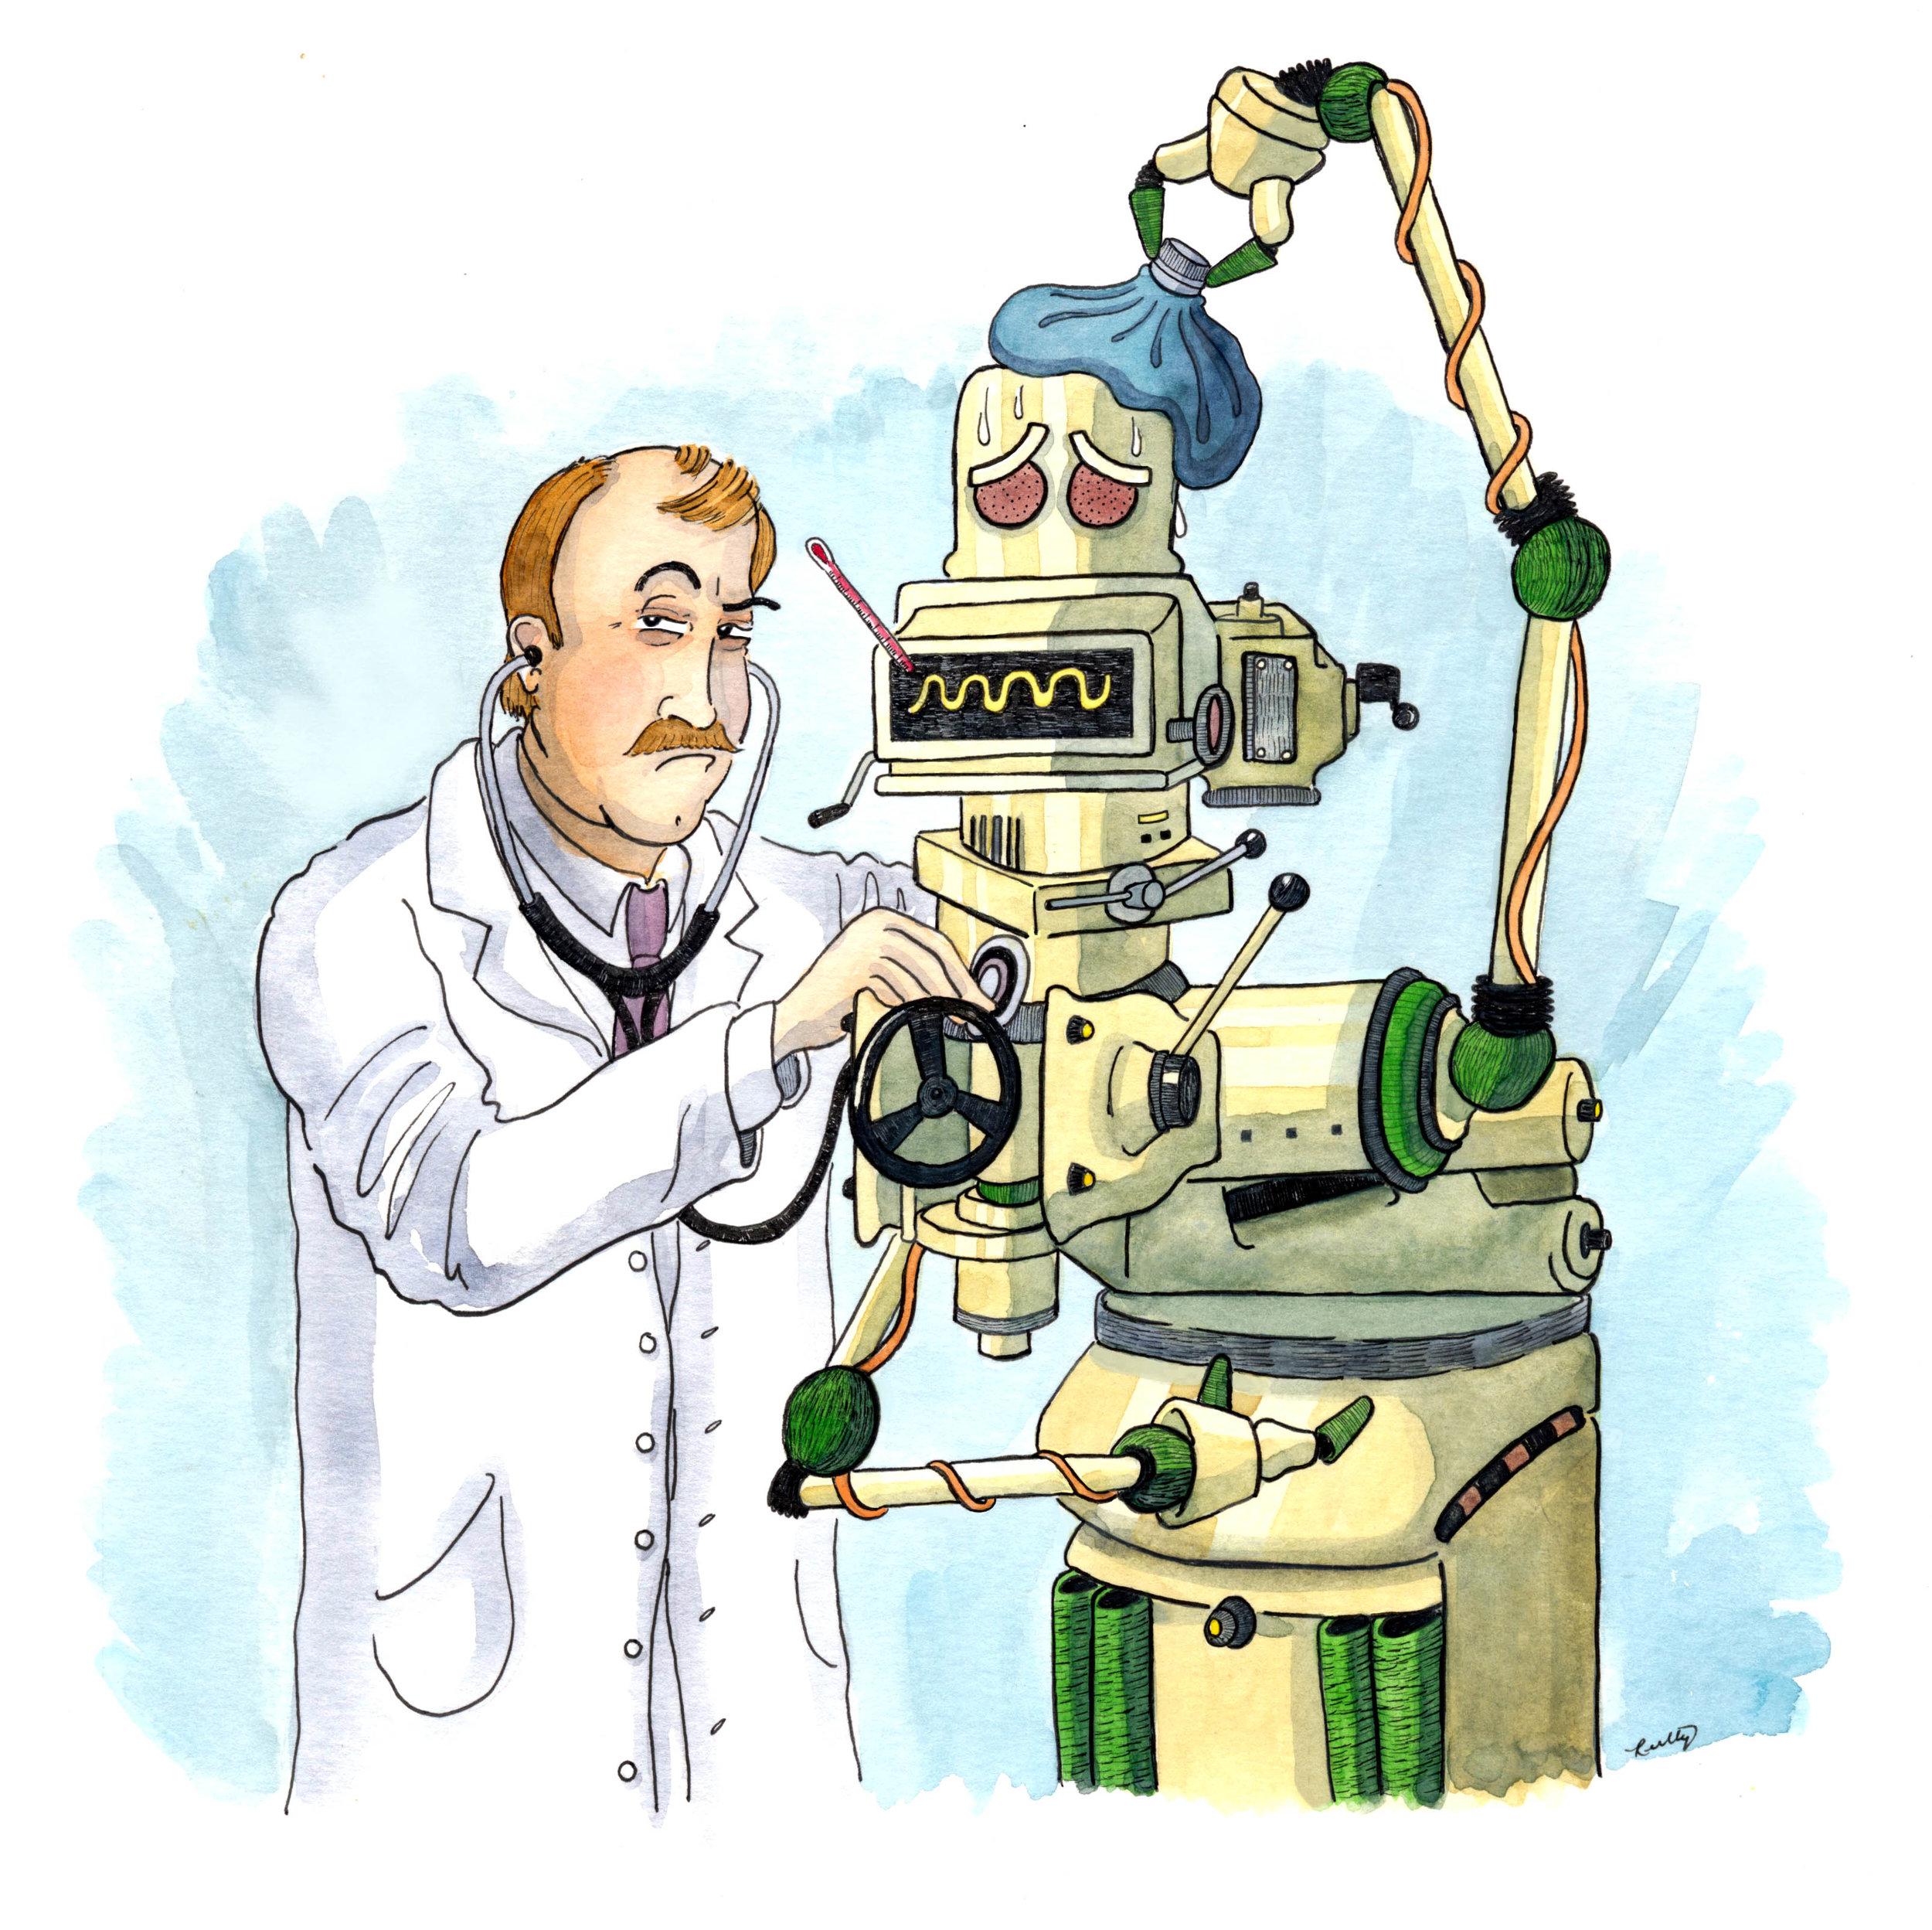 dr_robot_web.jpg